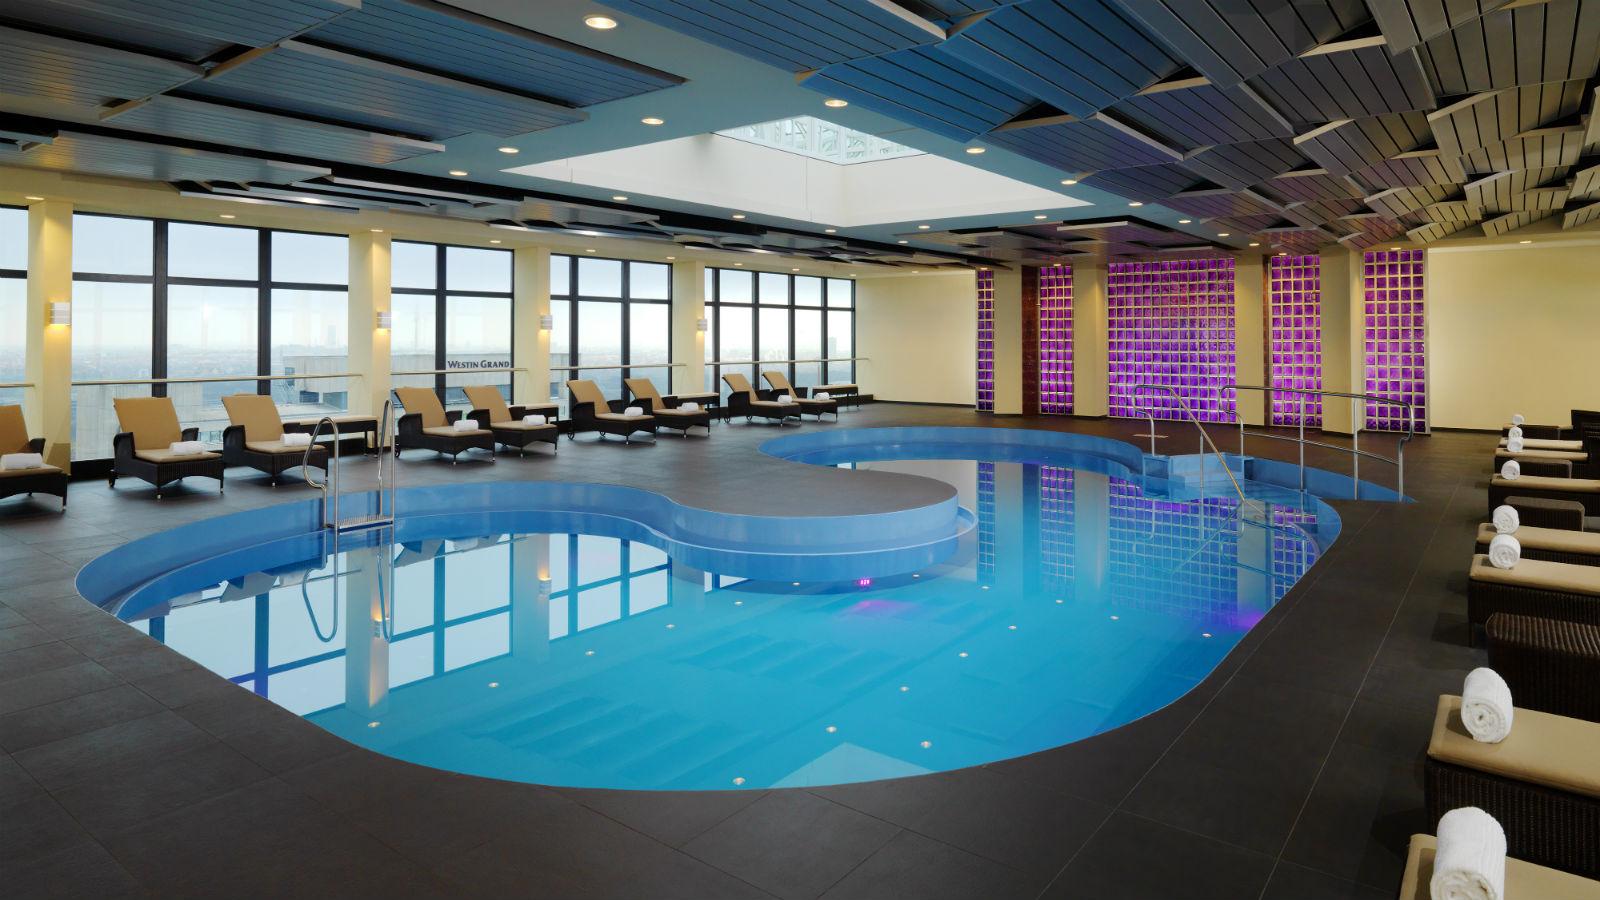 Pool Sheraton Muenchen Arabellapark Hotel